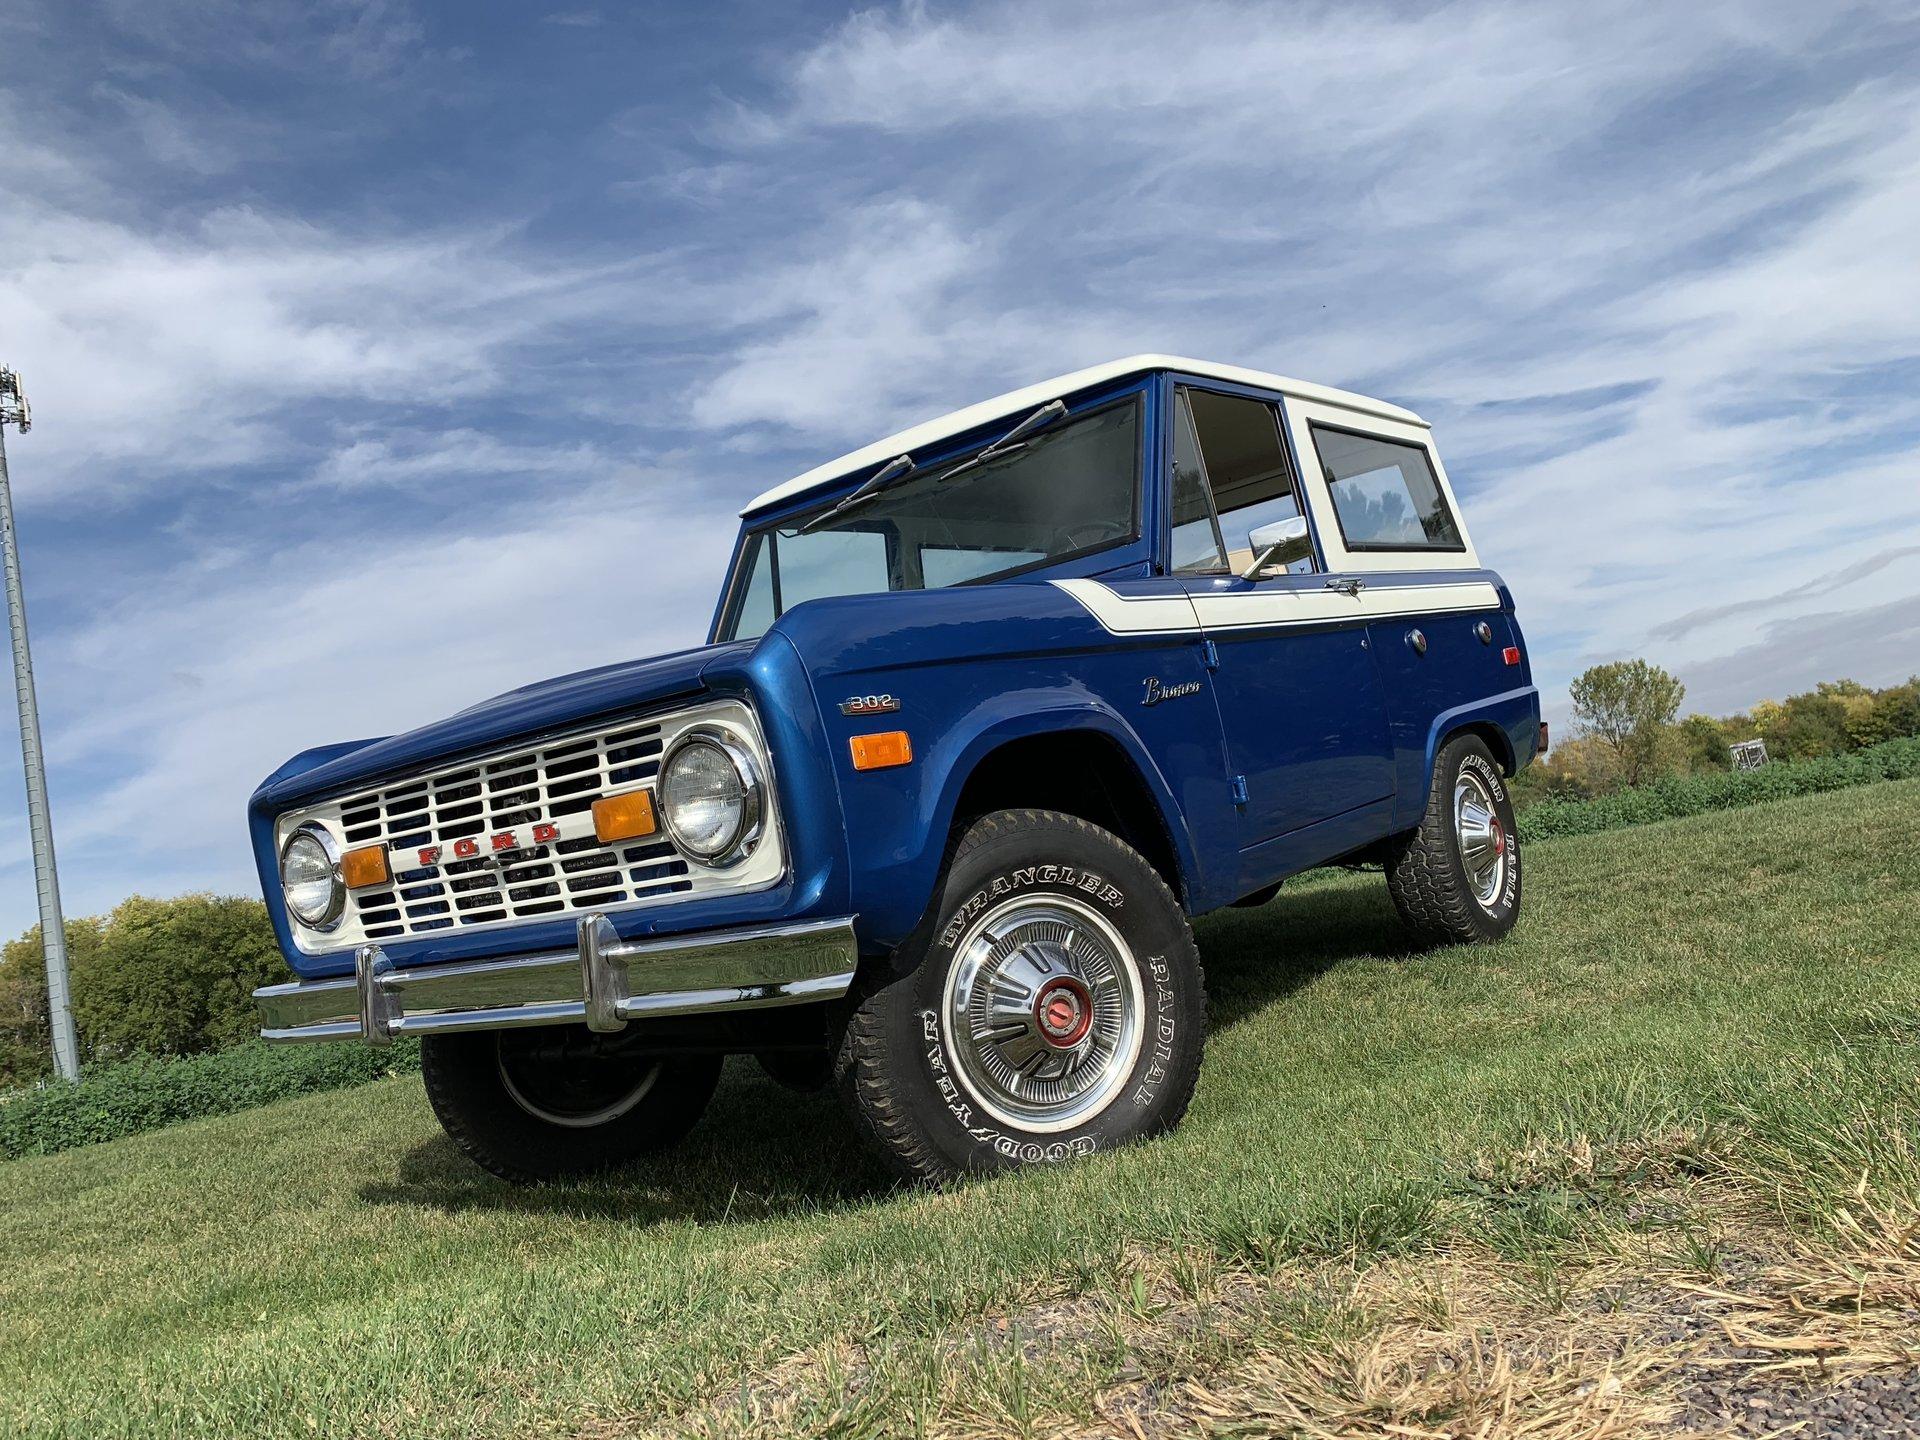 1976 Ford Bronco   Ford Bronco Restoration Experts ...